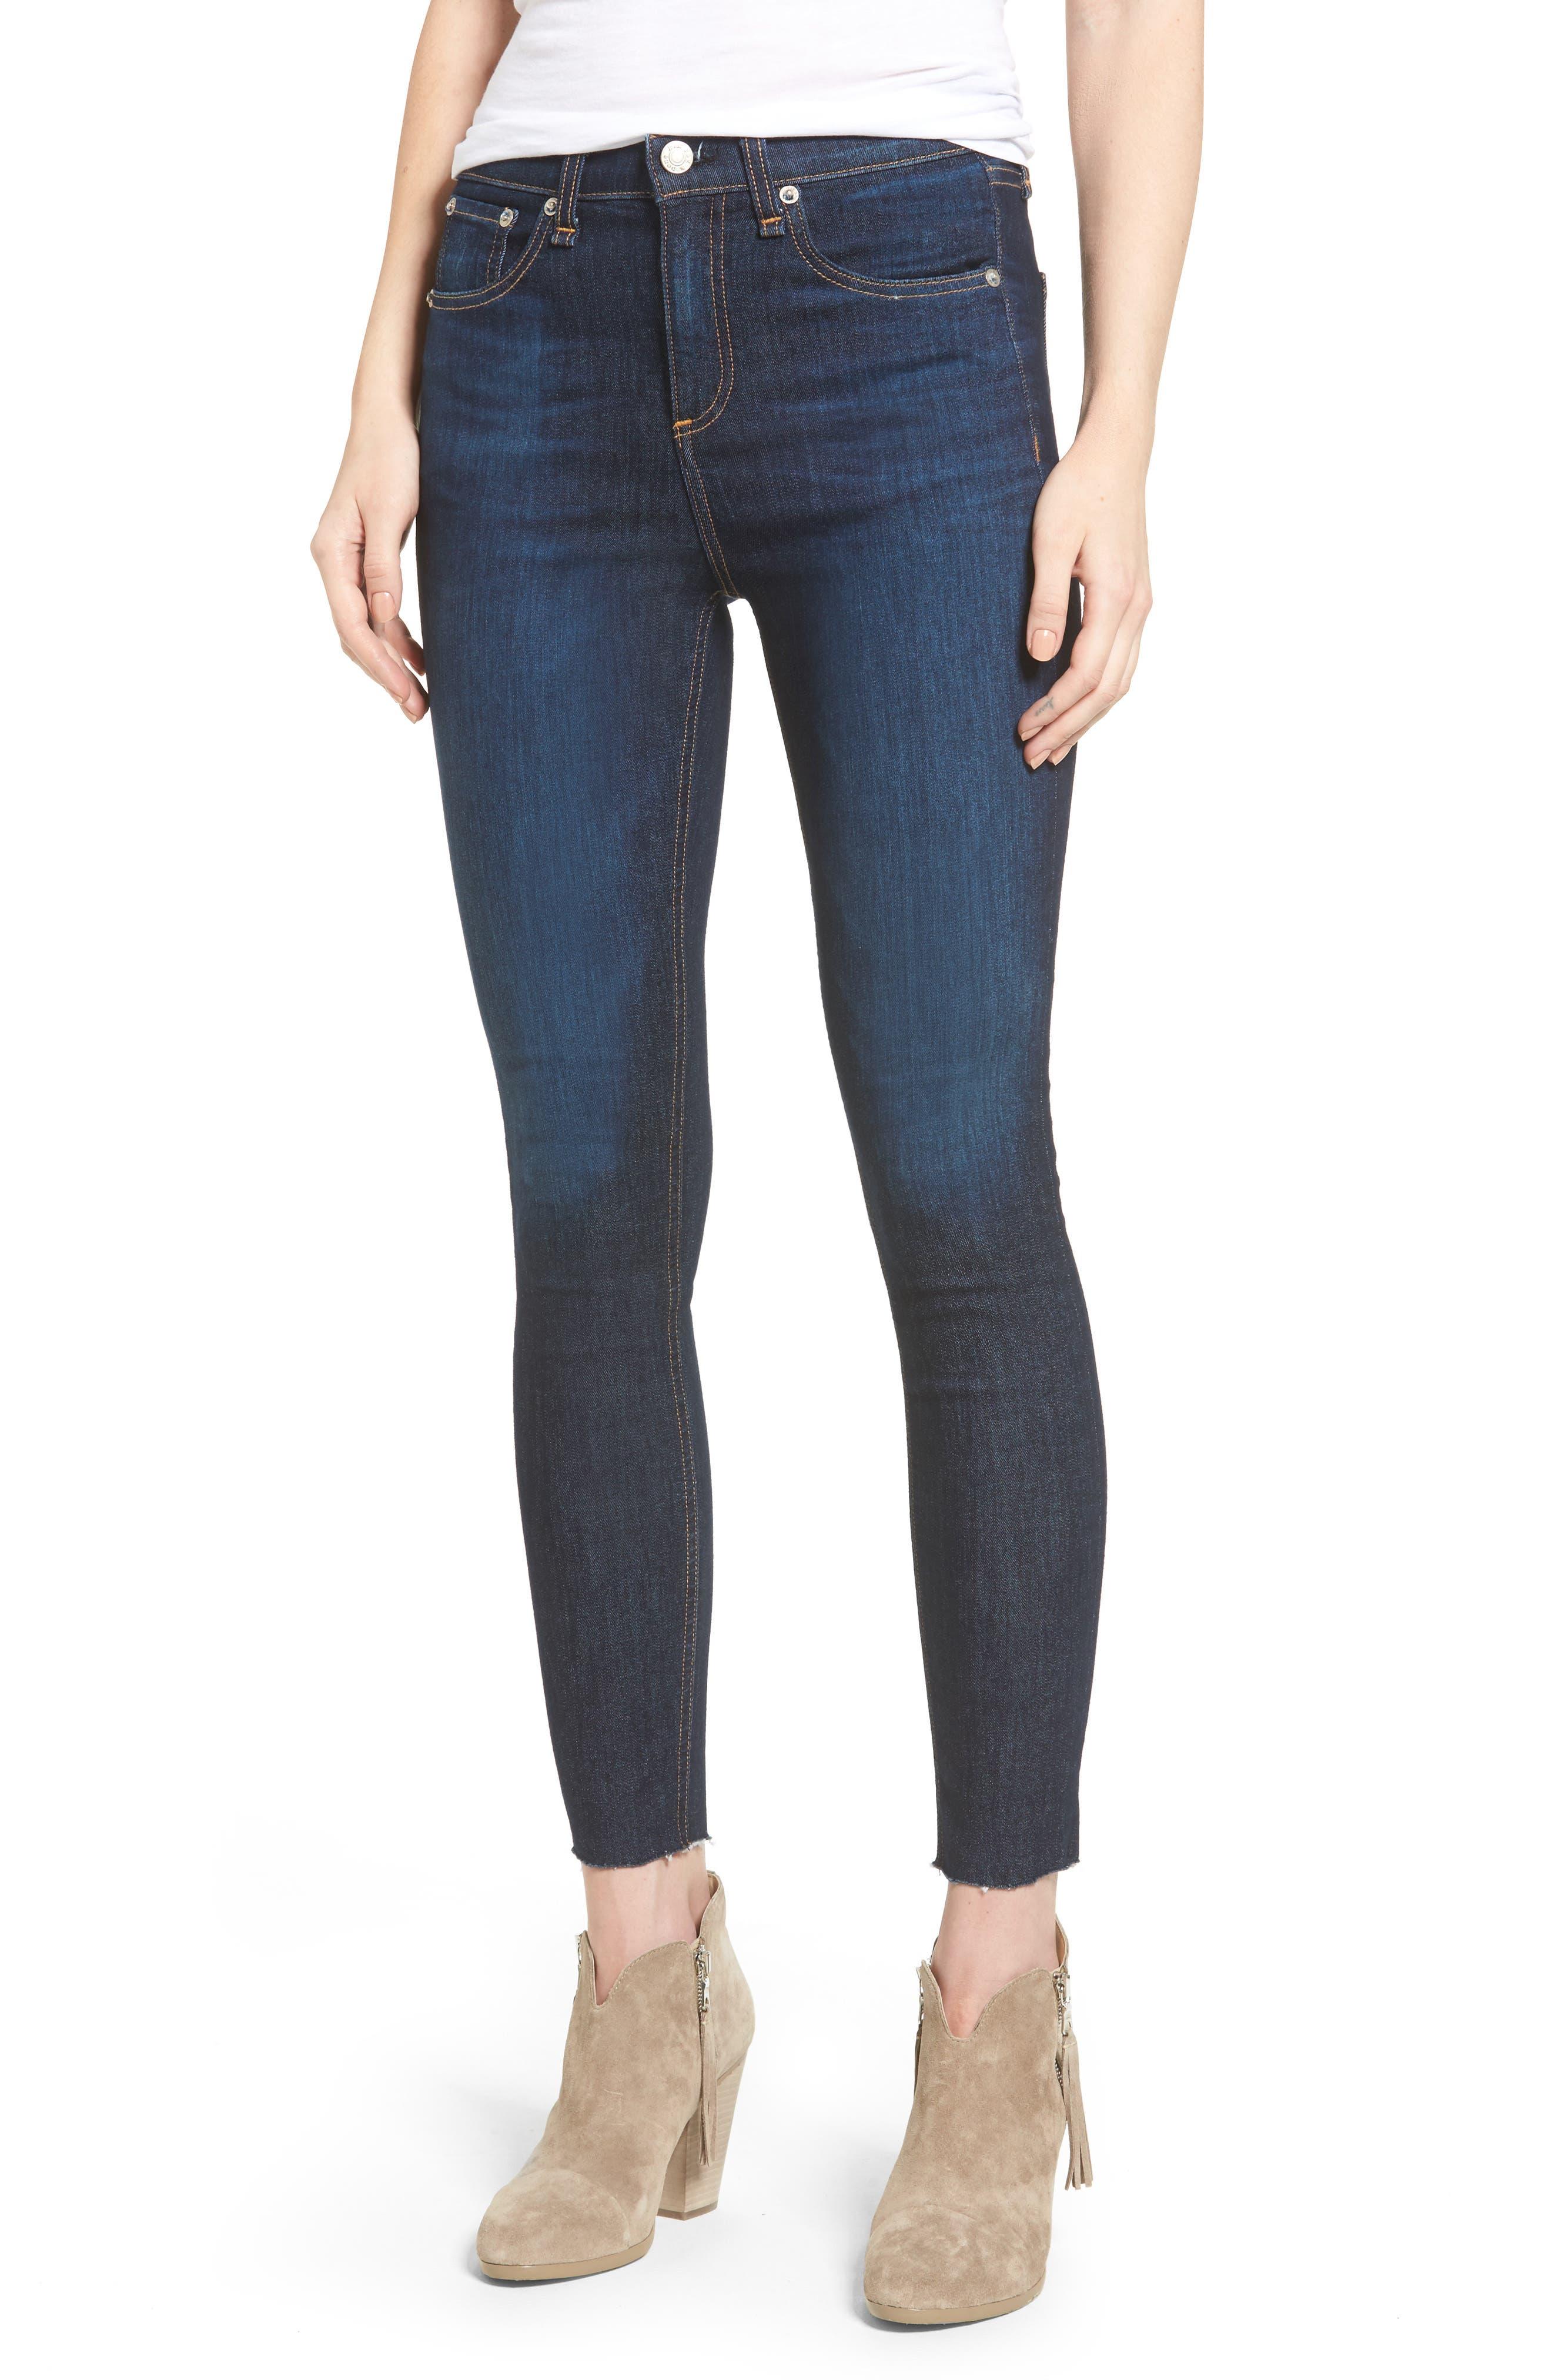 Alternate Image 1 Selected - rag & bone/JEAN High Waist Skinny Ankle Jeans (Mad River)